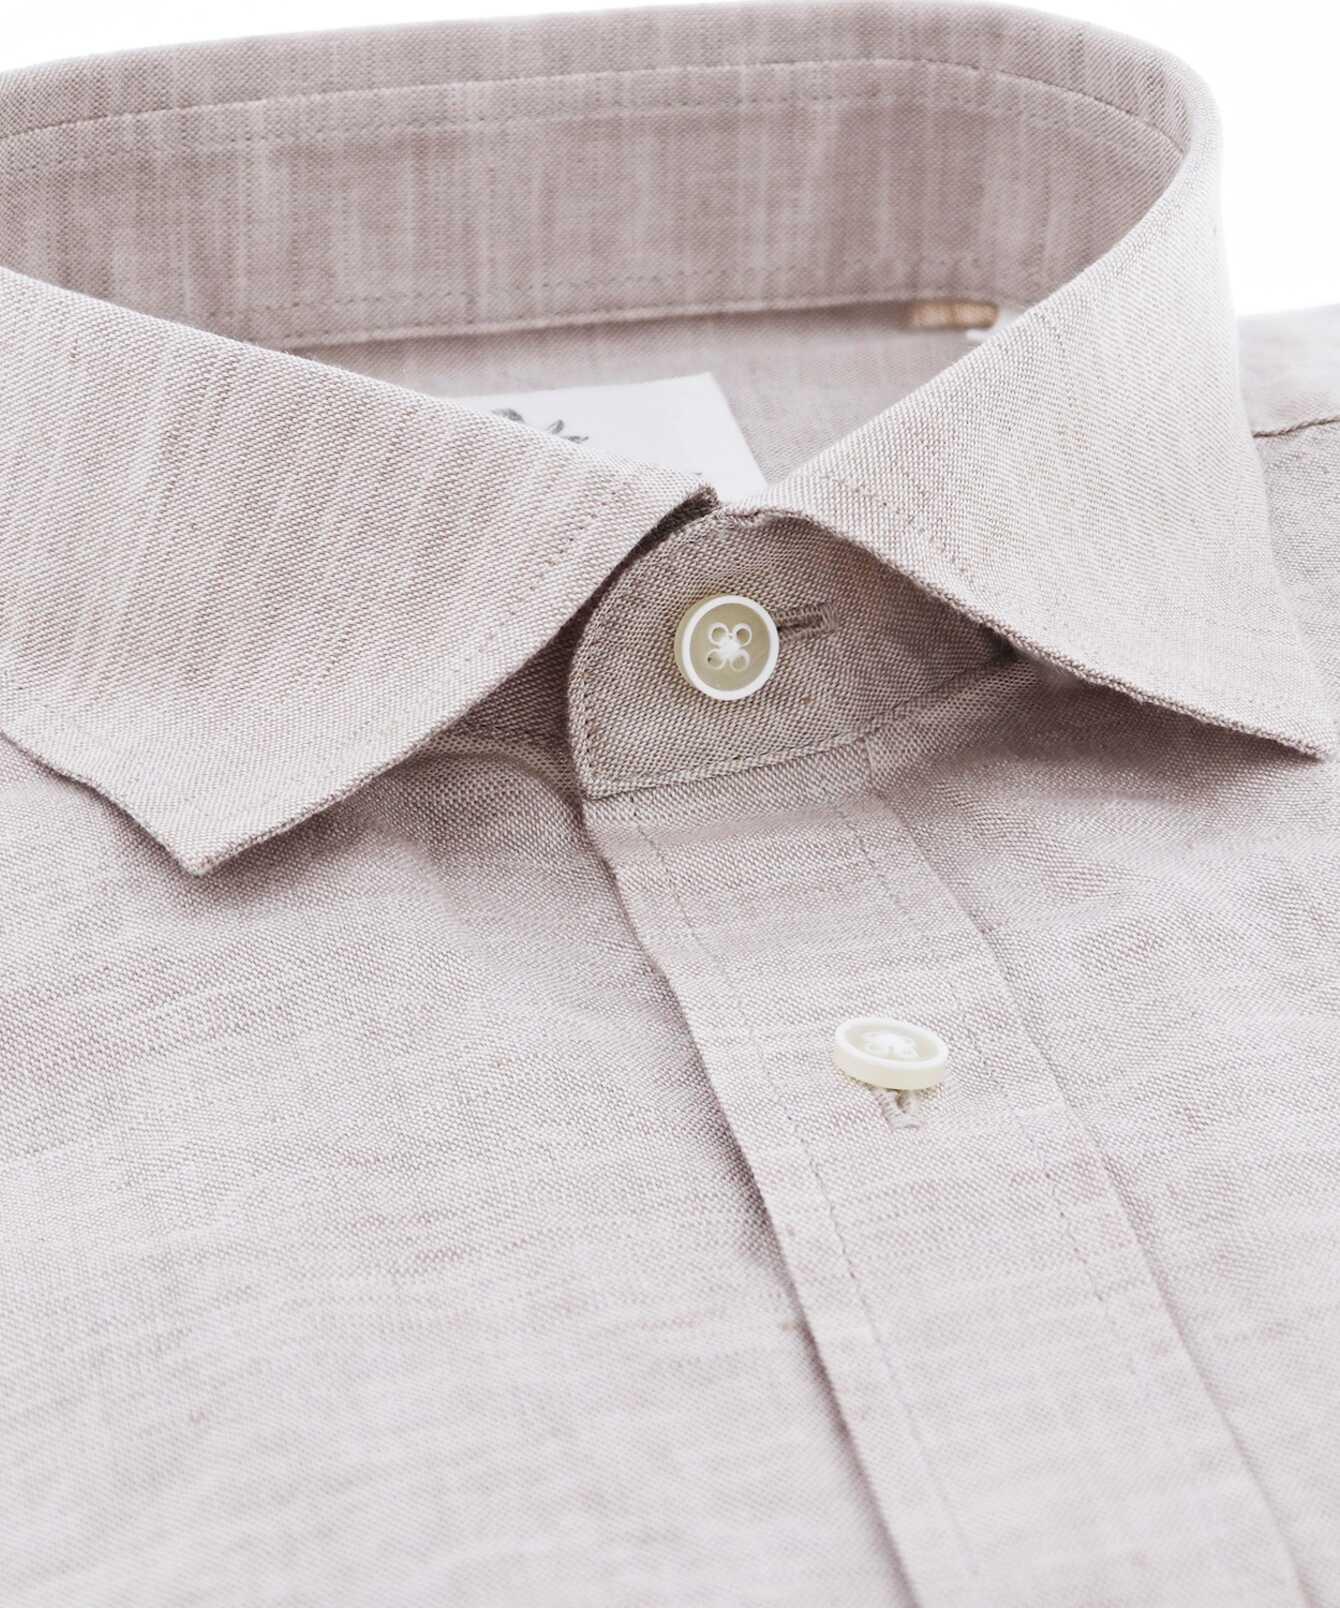 Shirt Portofino Linne Beige The Shirt Factory